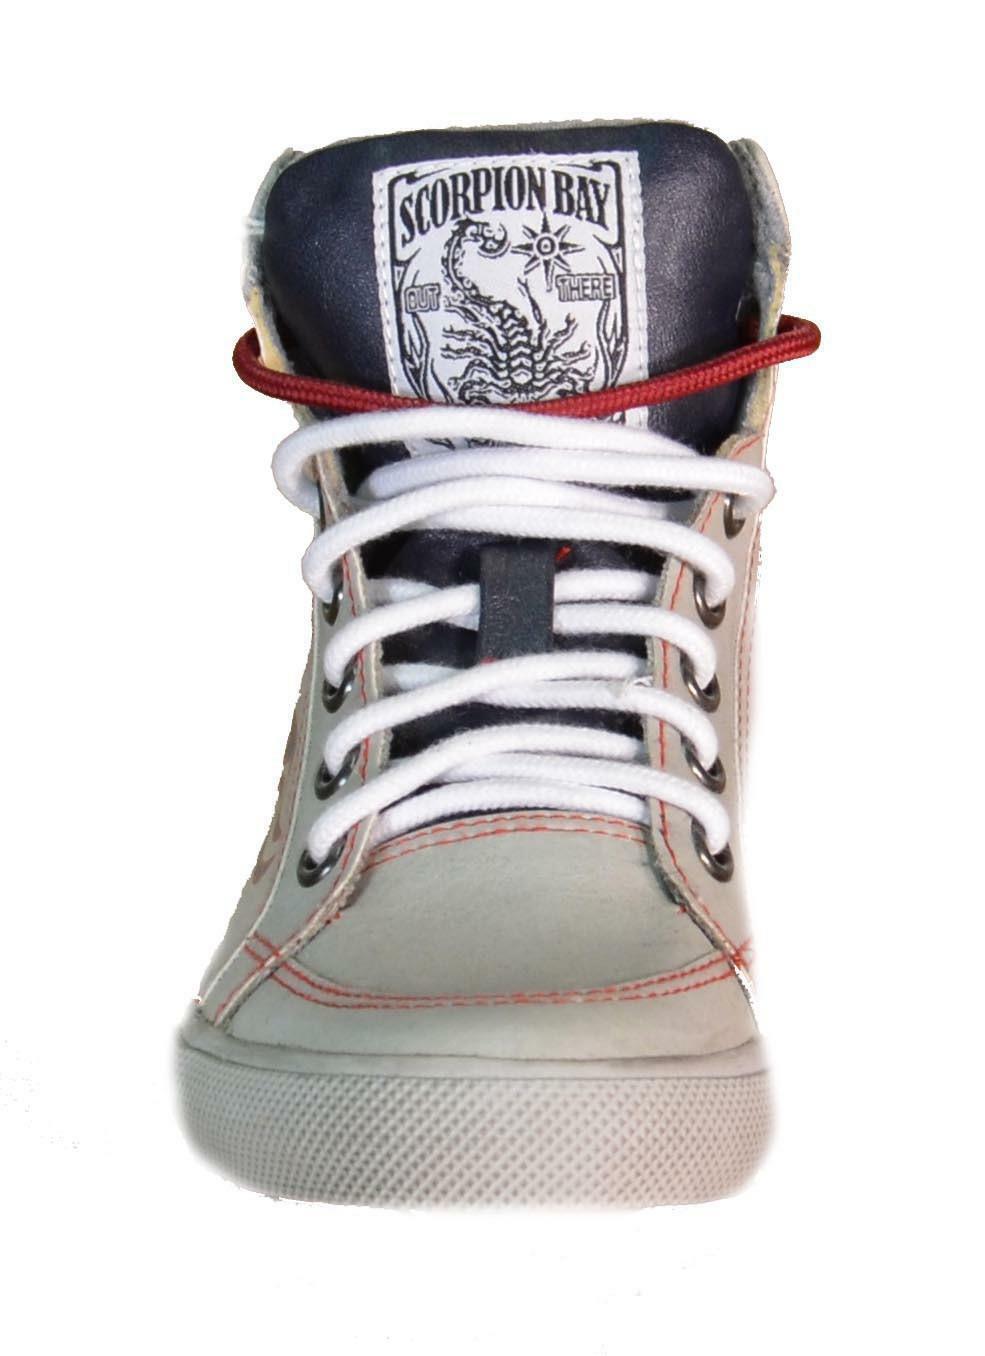 scorpion bay scarpe sportive bambino grigie pelle 511sb3